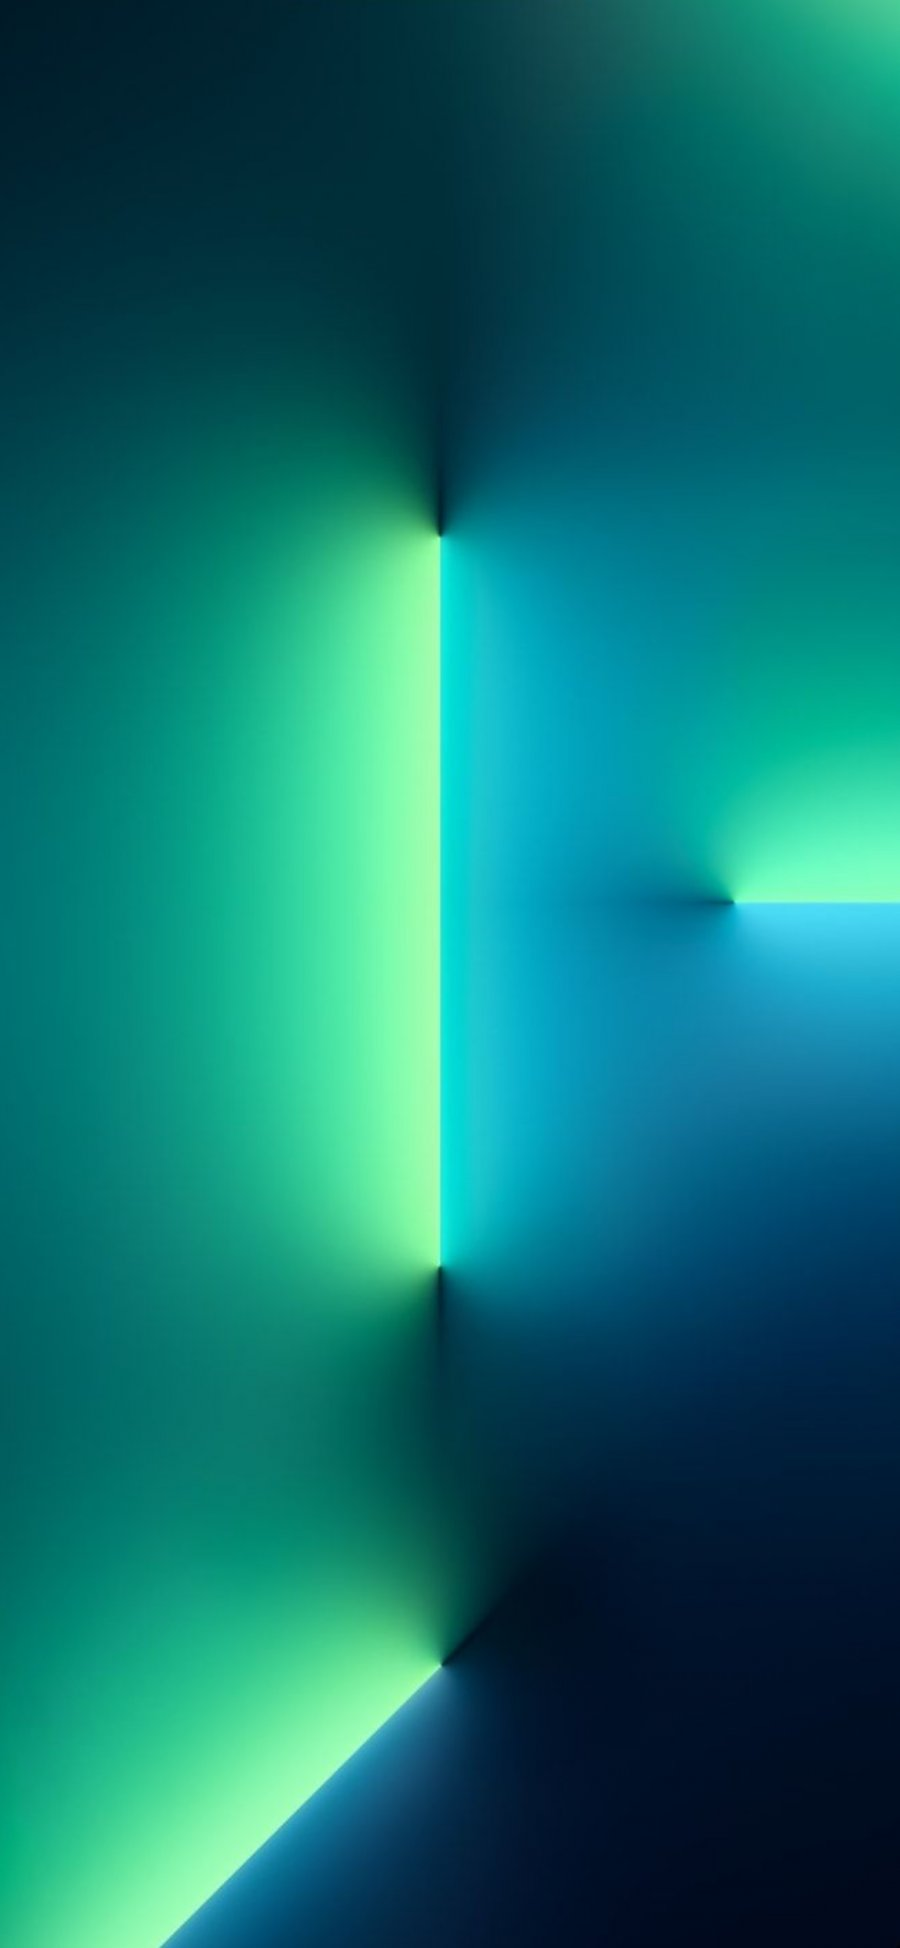 iPhone 13 Pro wallpaper green